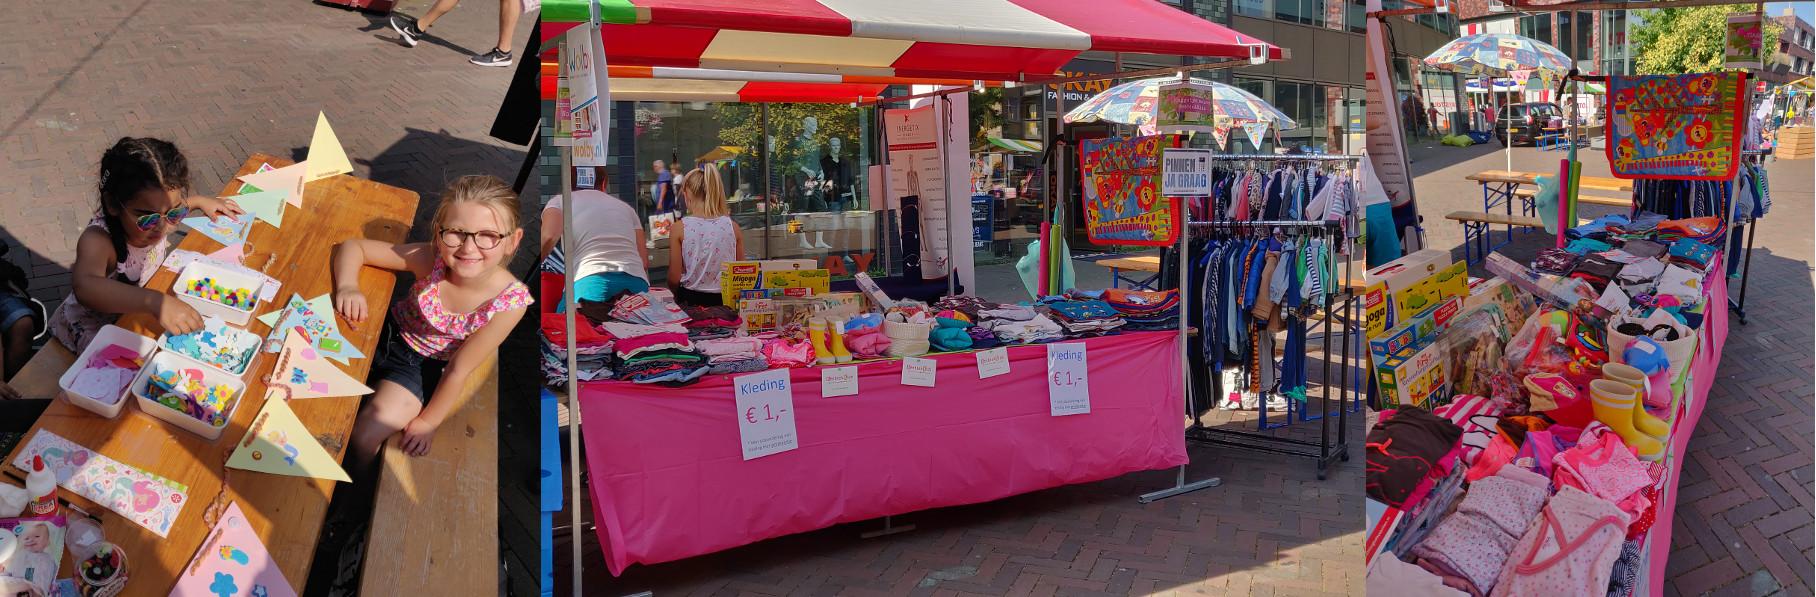 Kidsproof Kinderfeest Almere Buiten augustus 2019